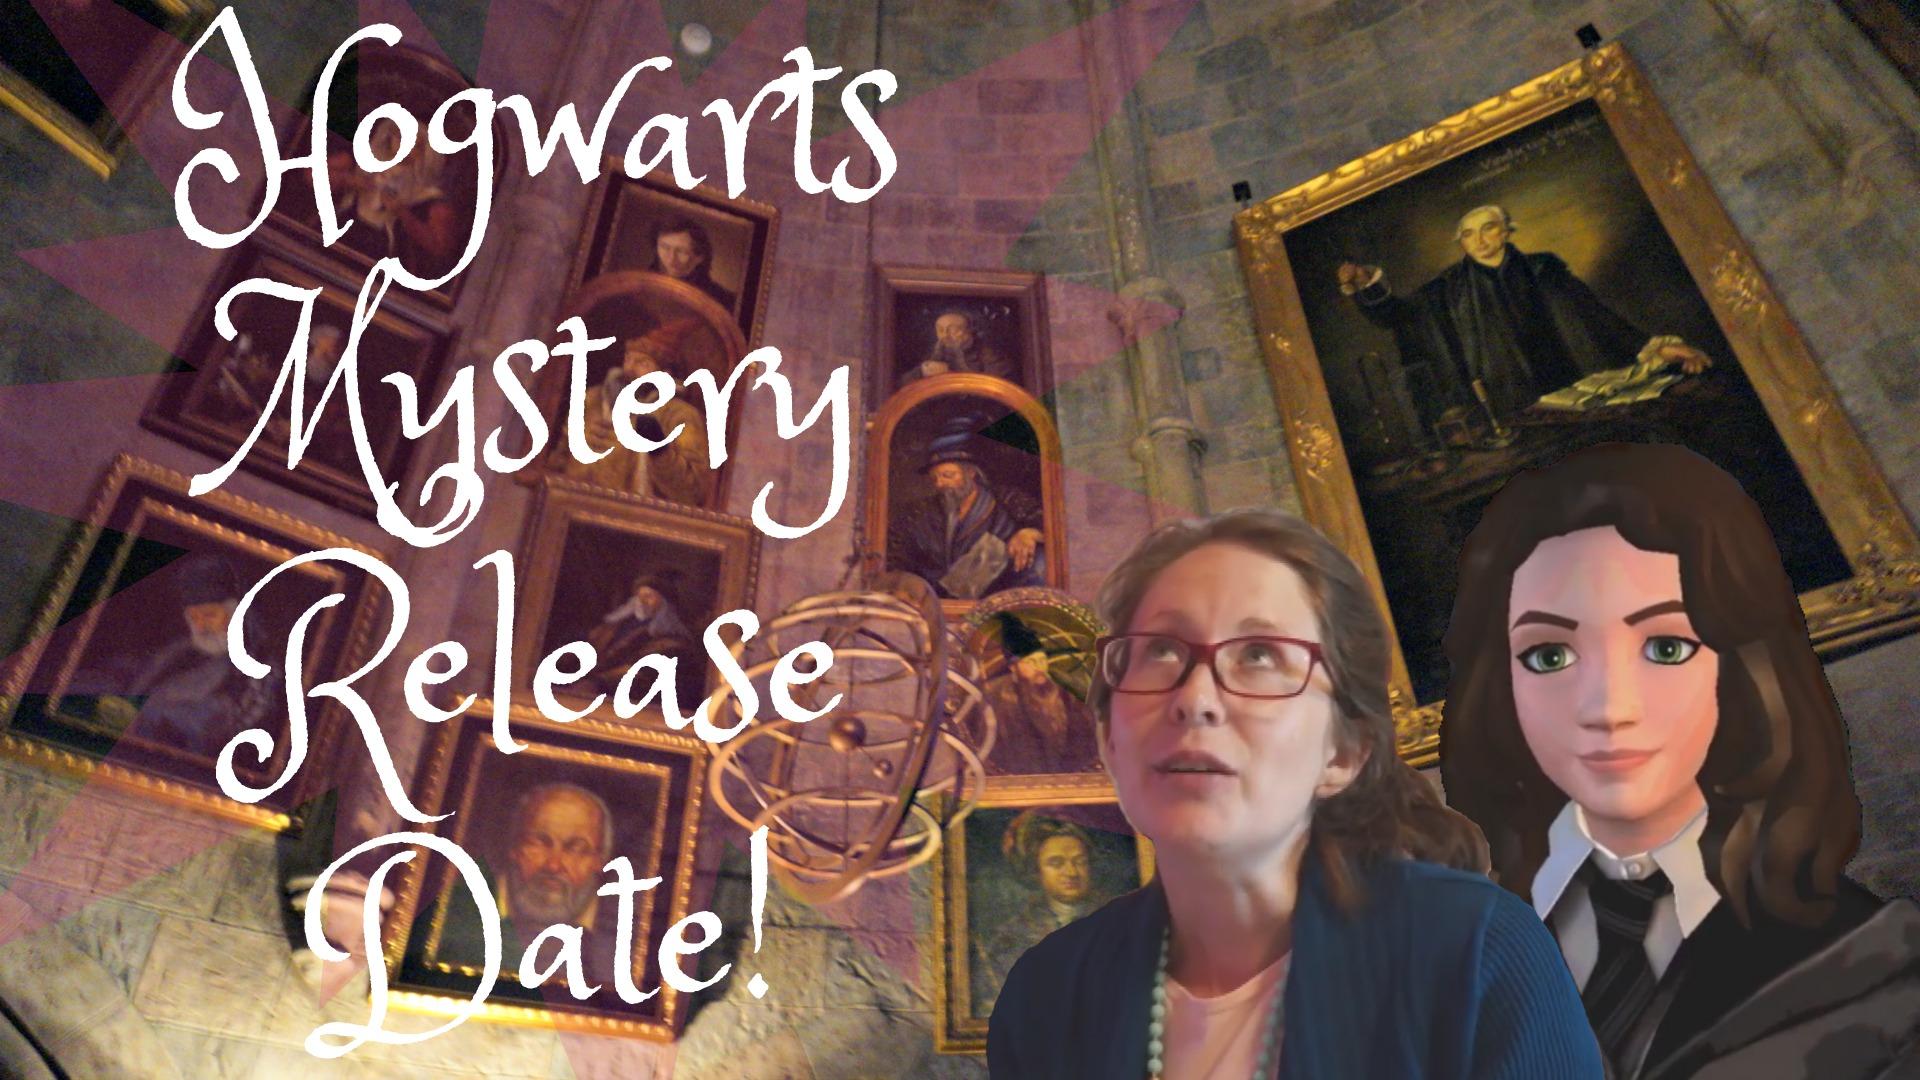 Dating hogwarts mystery in Australia